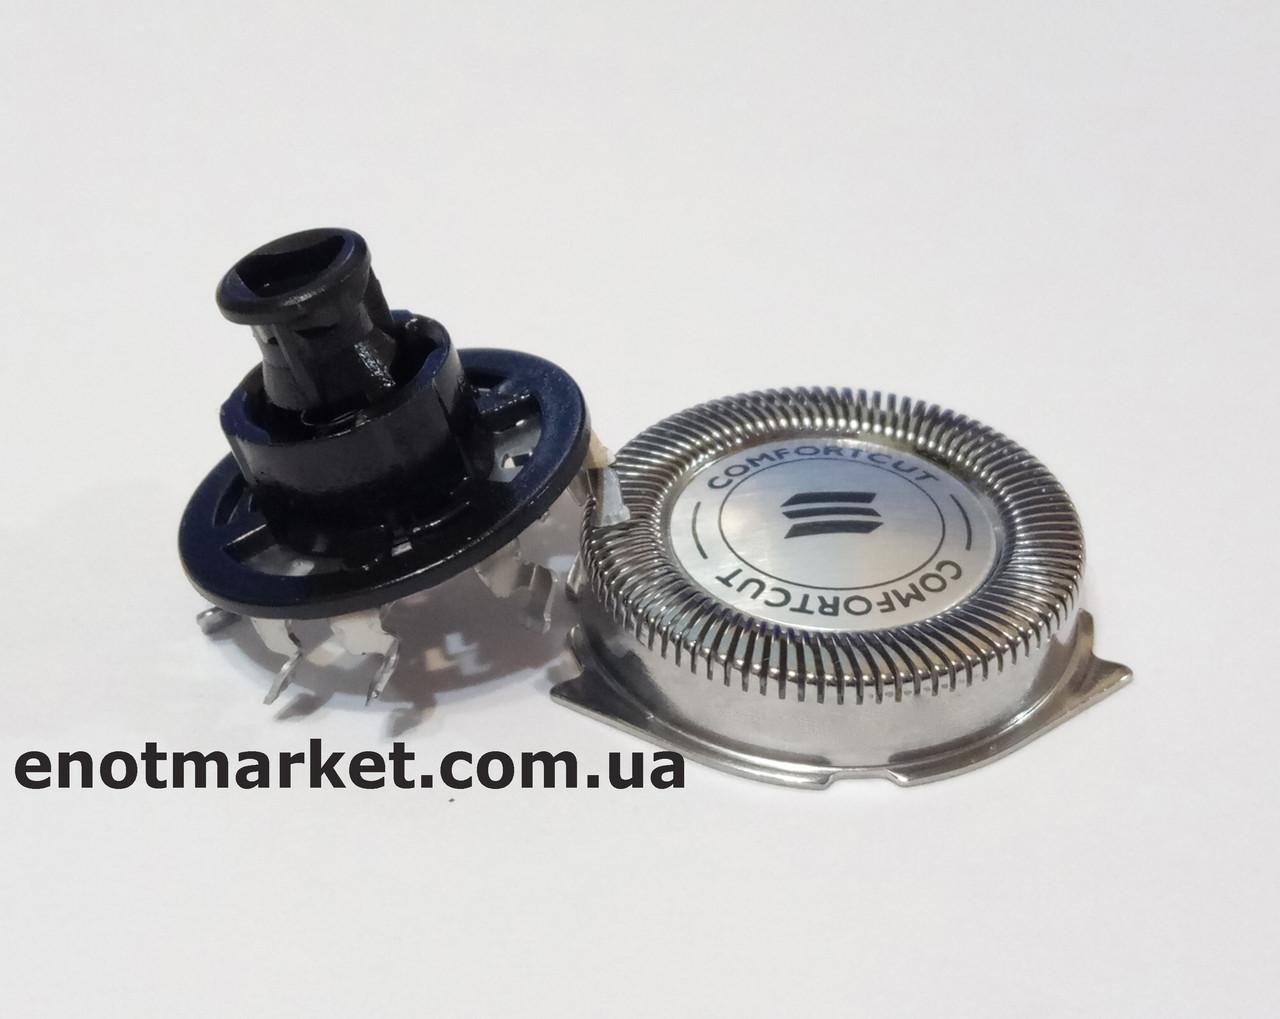 Бритвенная головка (комплект: 1 сеточка + 1 лезвие) для электробритвы Philips (аналог) серии RQ, YS, YQ